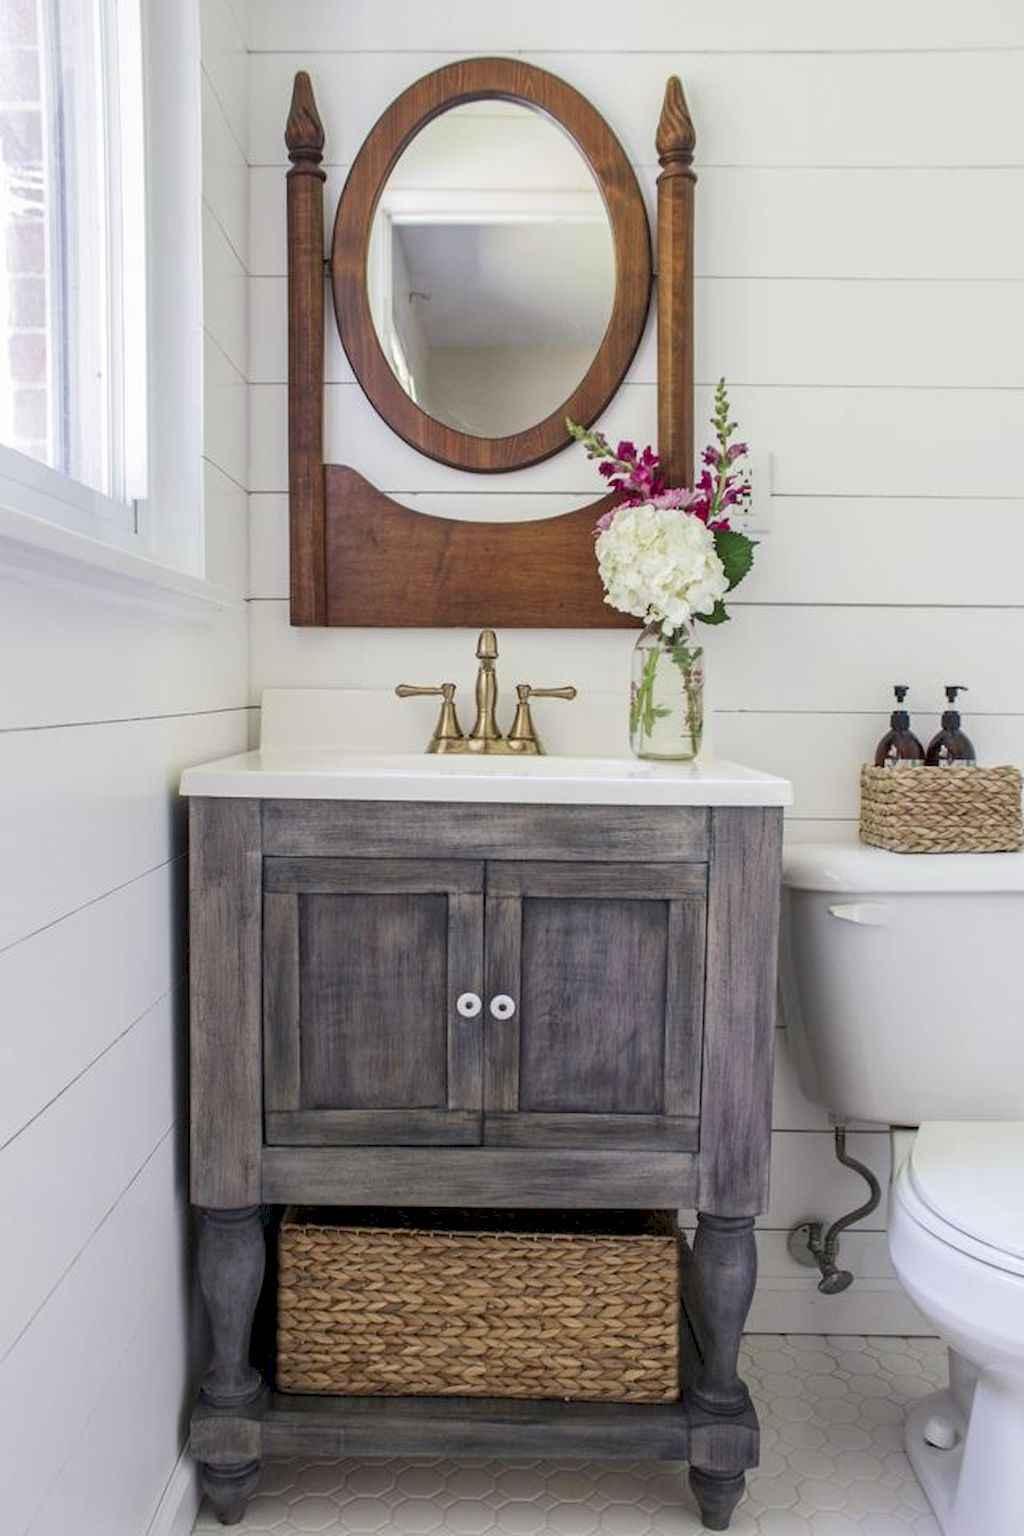 125 awesome farmhouse bathroom vanity remodel ideas (43)